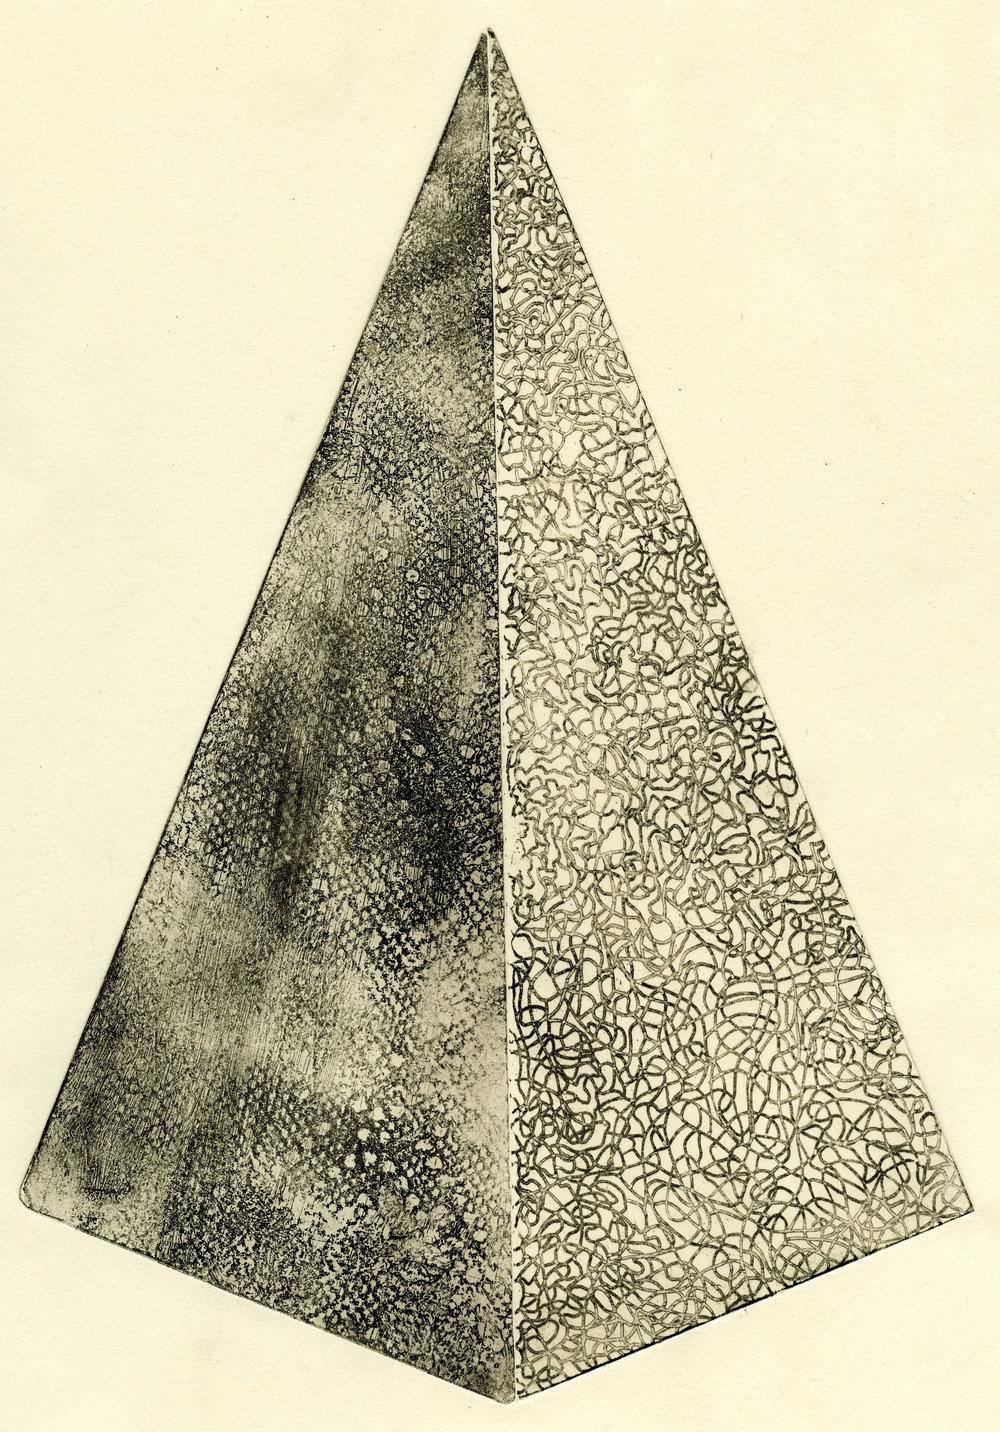 etching011.jpg